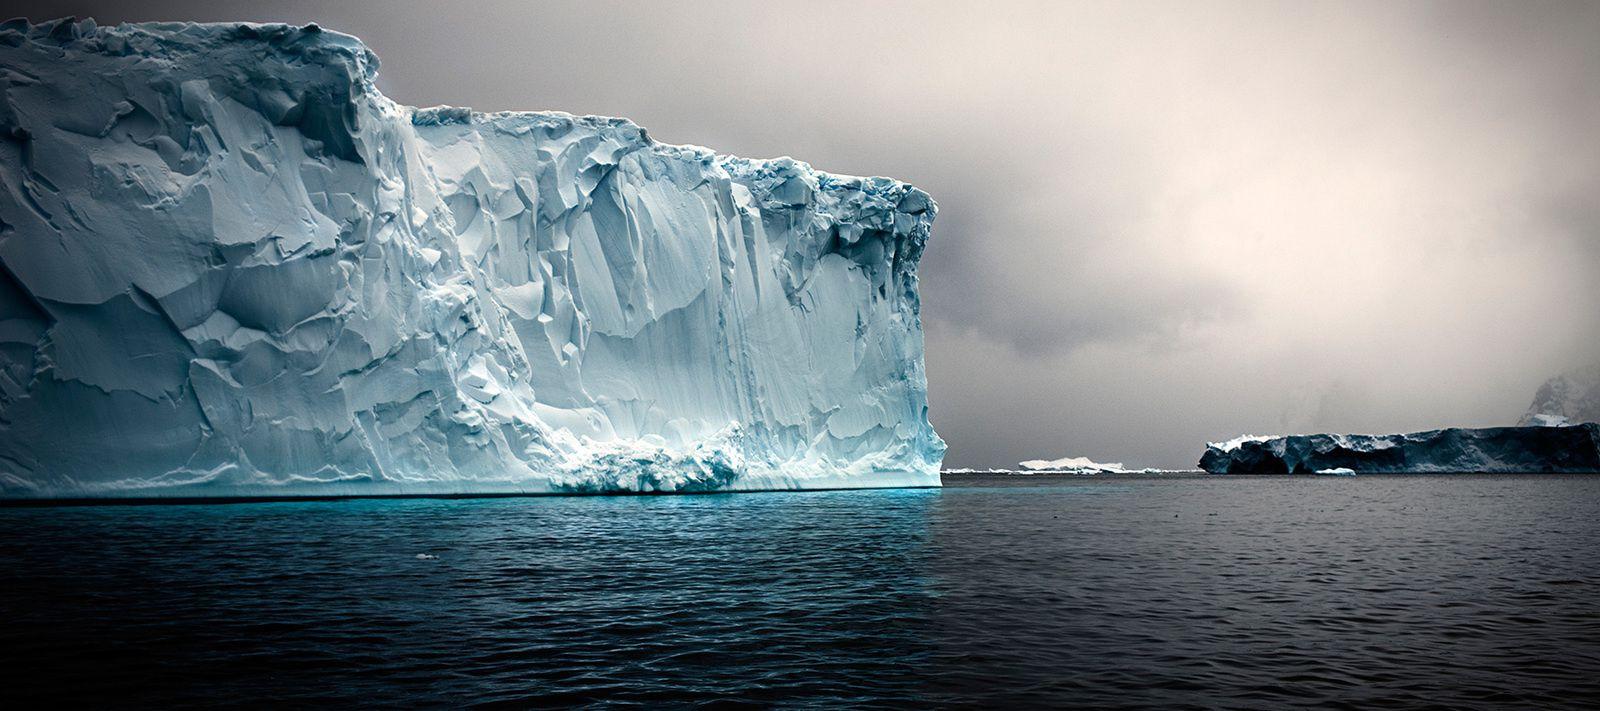 Condamnés à devenir intelligents : Camille Seaman, Haunting photos of polar ice